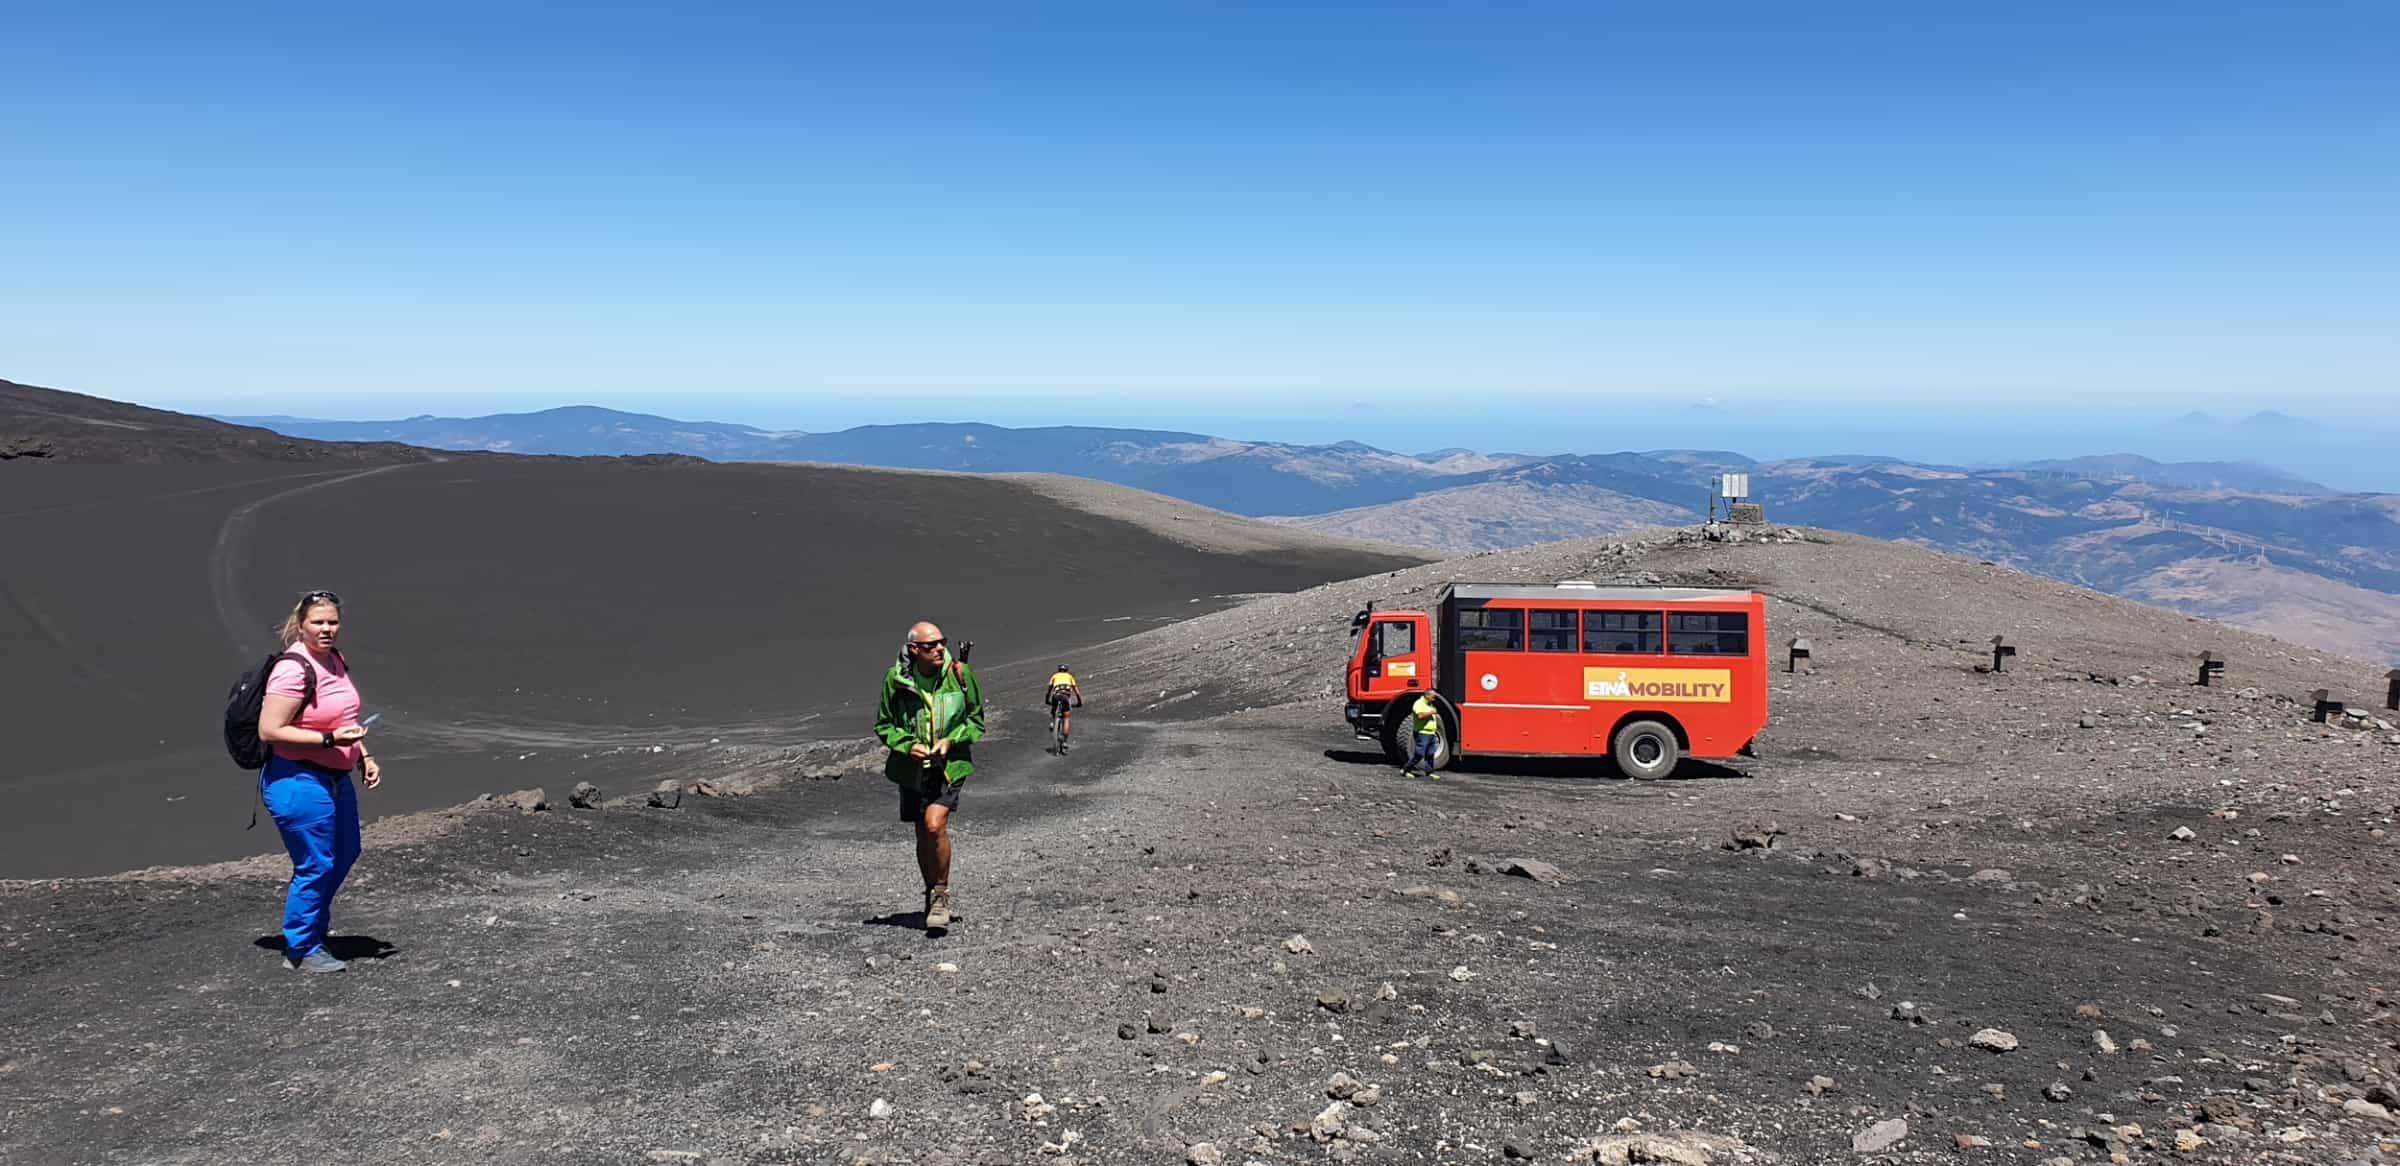 etna escursione trekking 2800m